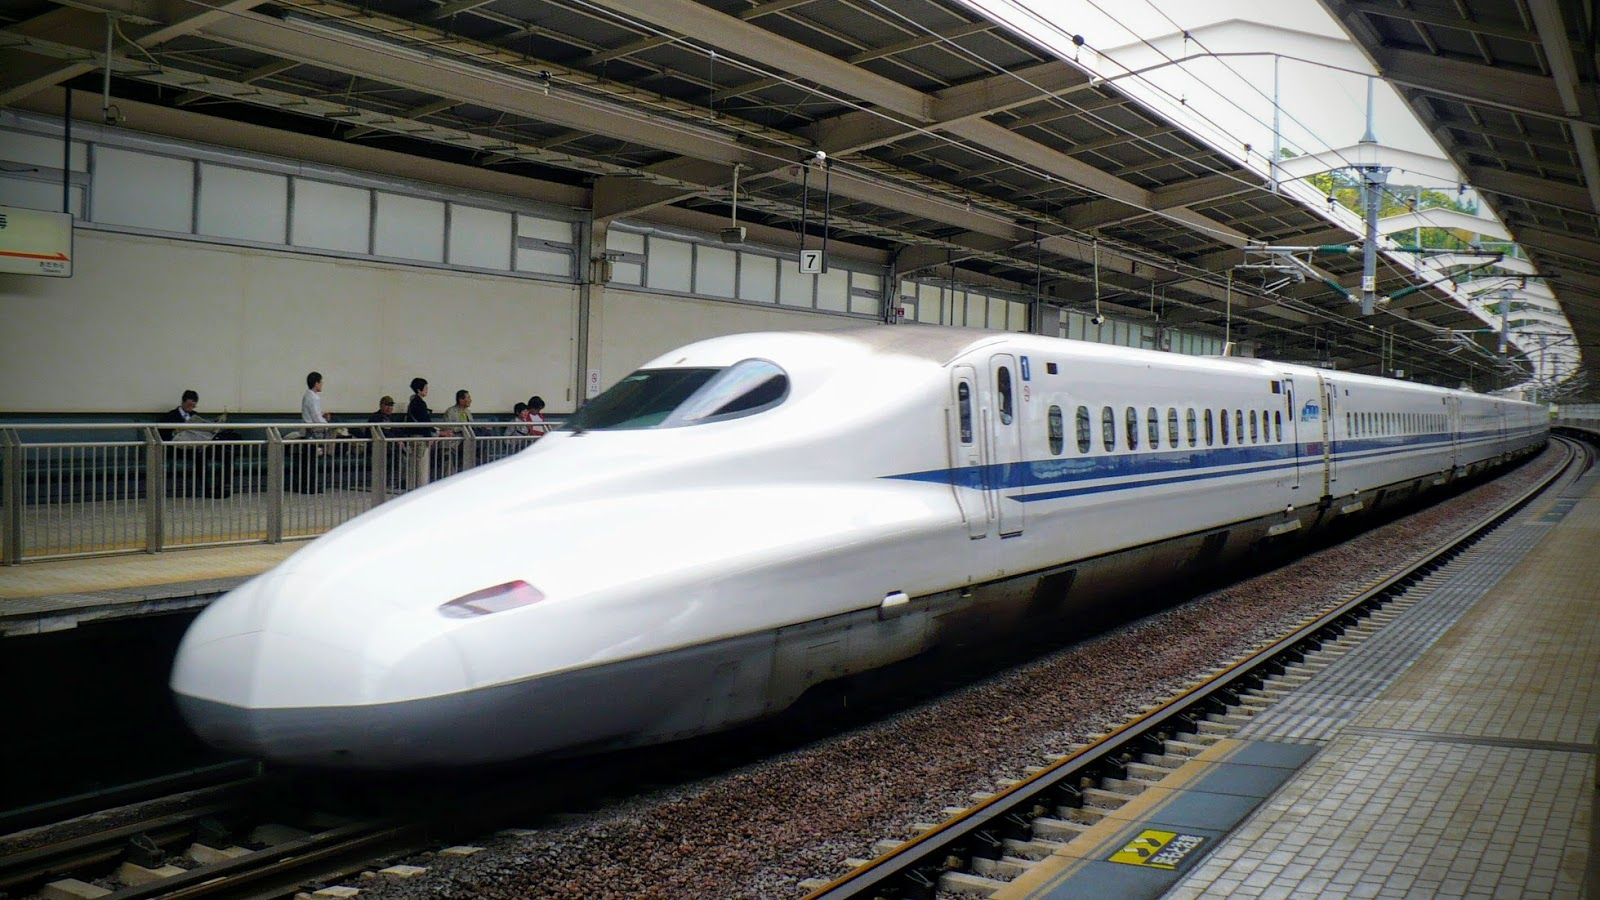 新大阪駅 時刻表|東海道・山陽新幹線|ジョルダン